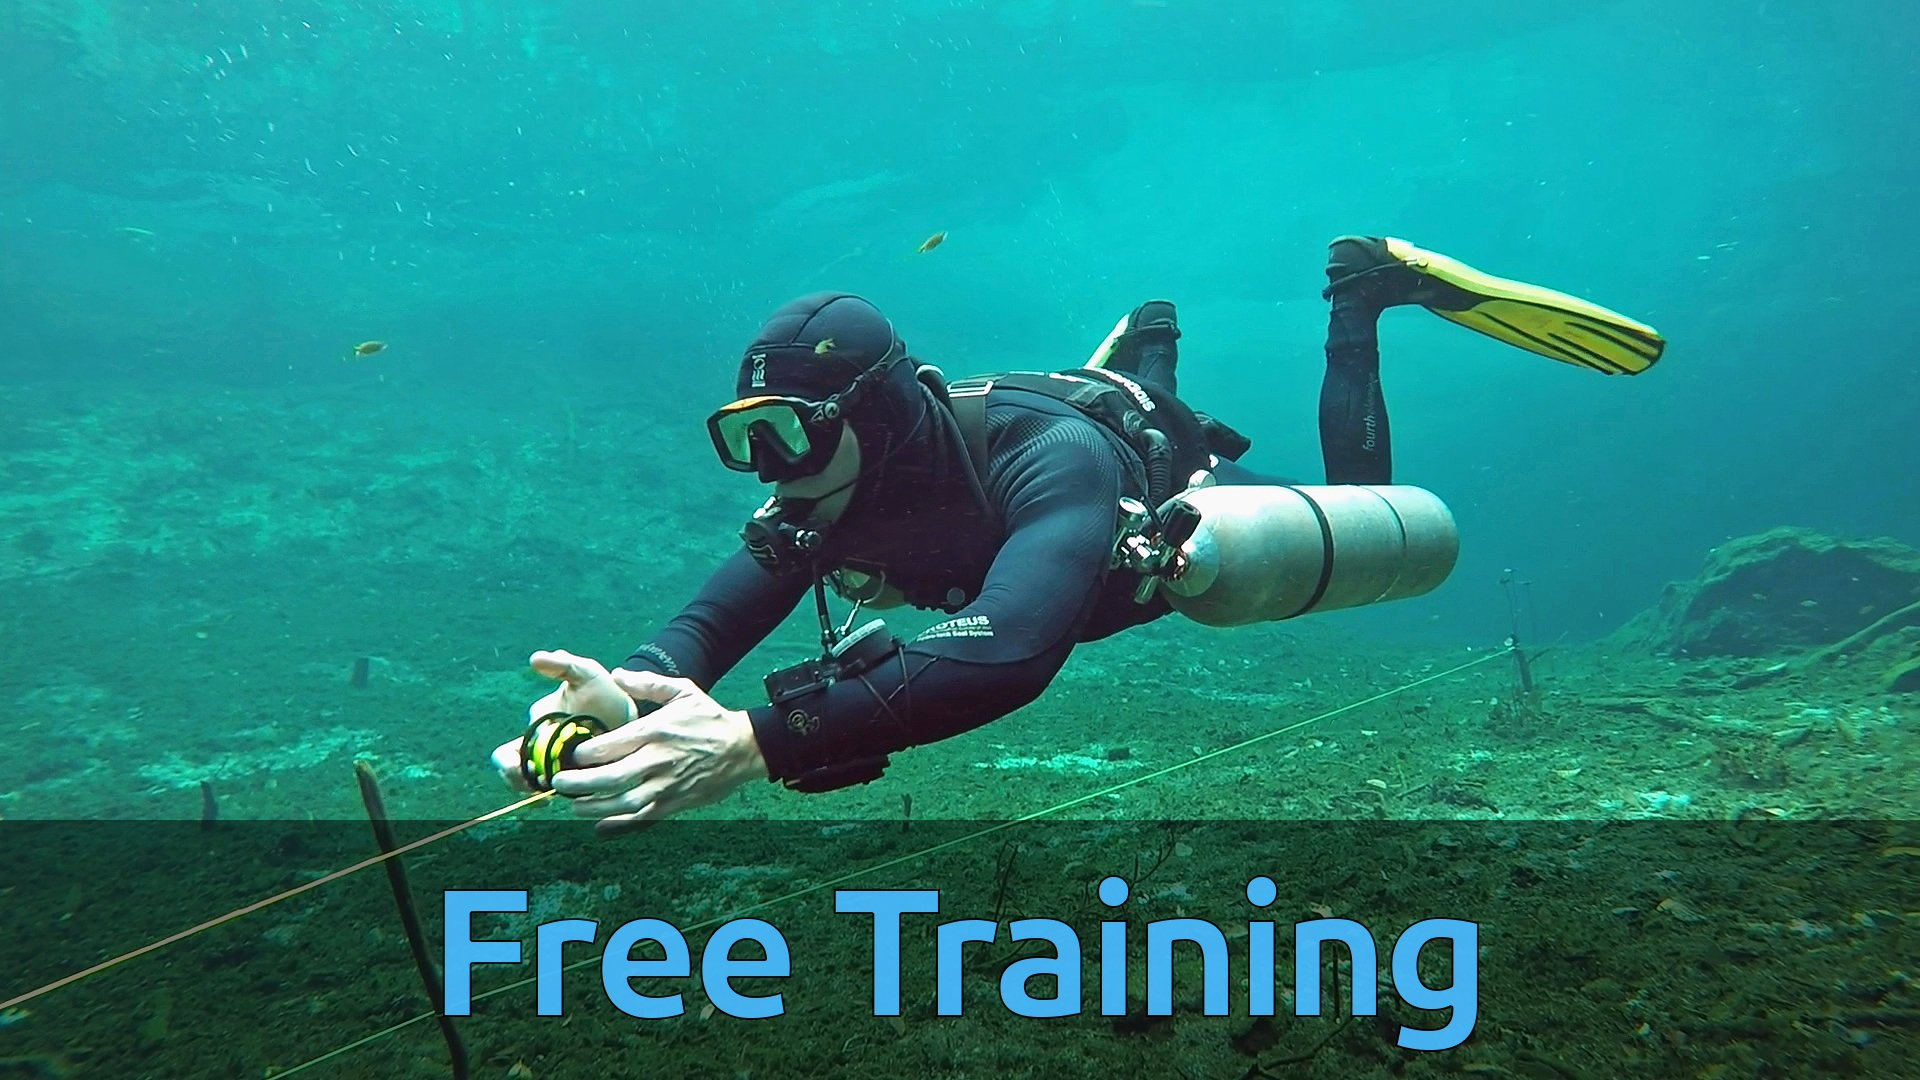 Free Training | 6 h 04 min split over 45 videos